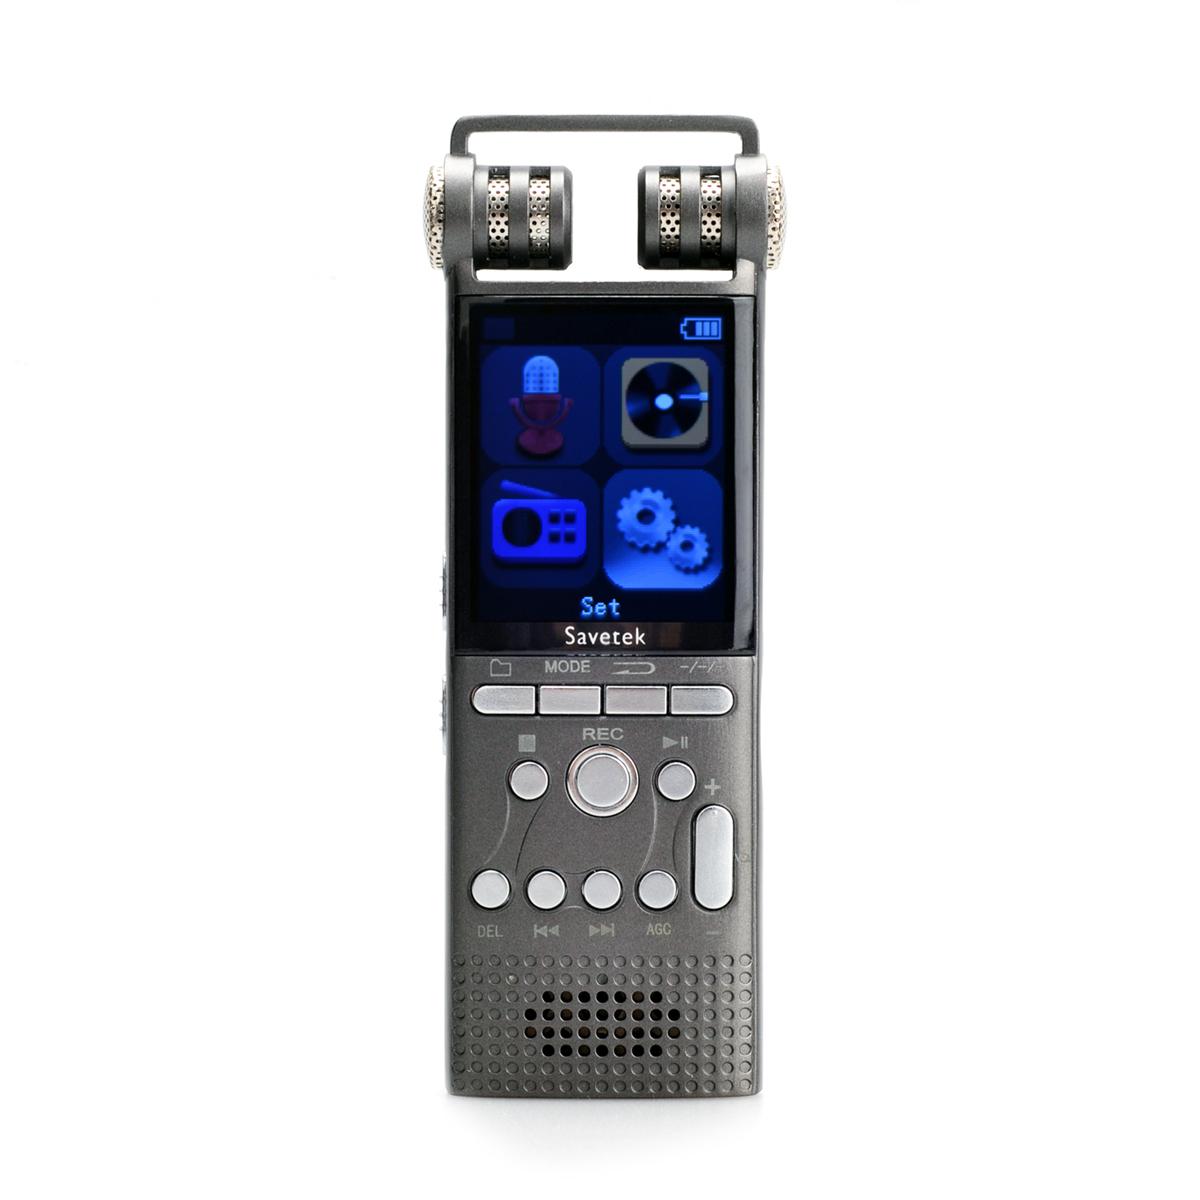 Savetek 4gb digital hidden audio dvr voice recorder pen